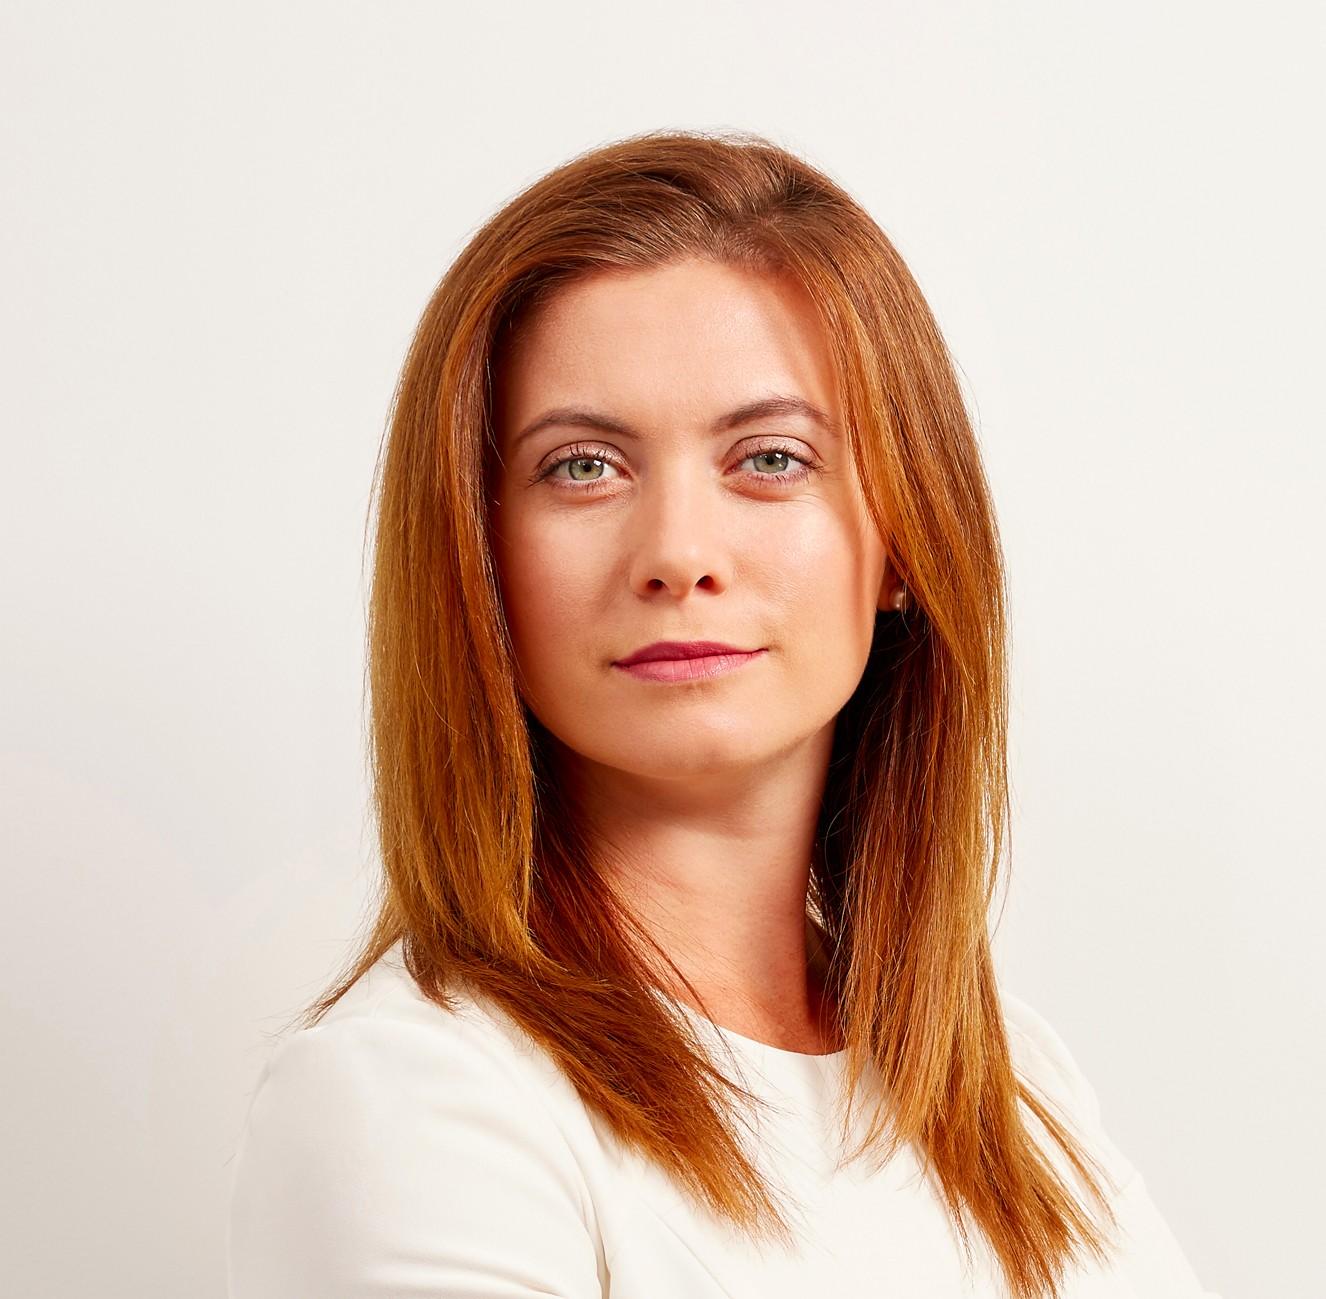 Rachel McLean